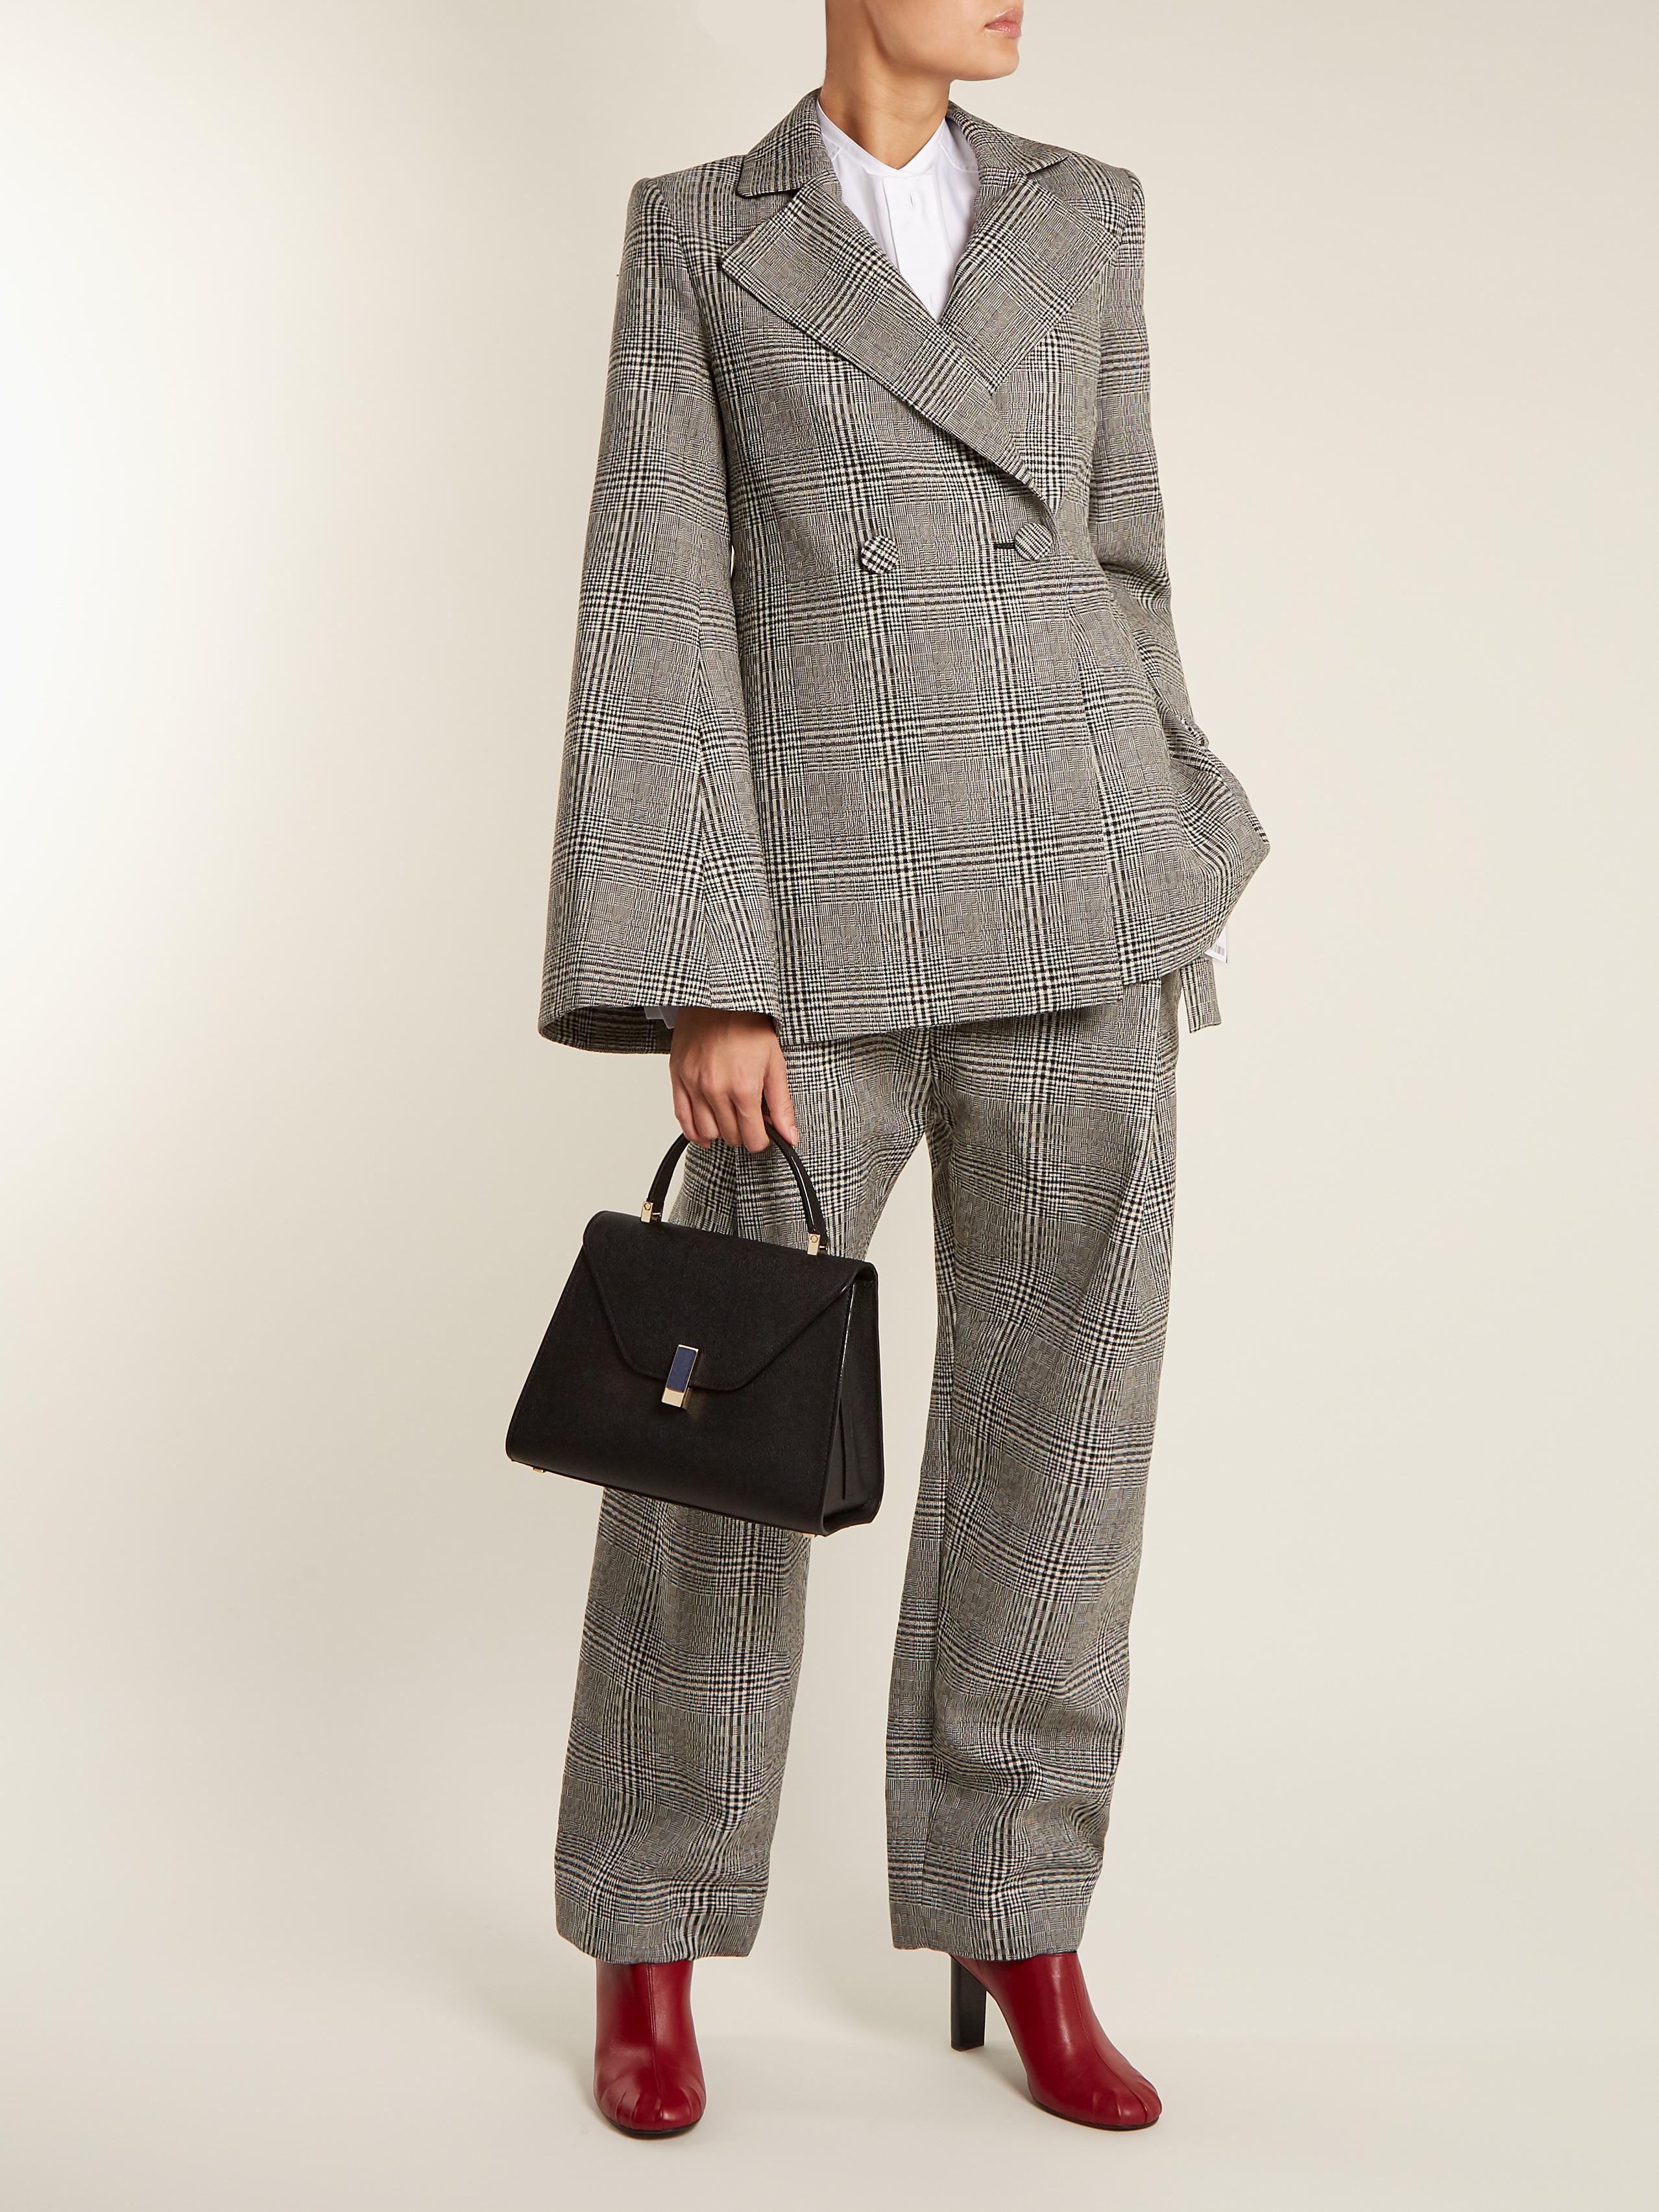 8a65f9c7a130 https   www.lyst.com clothing hm-faux-fur-jacket-7  2018-09-06T21 45 ...